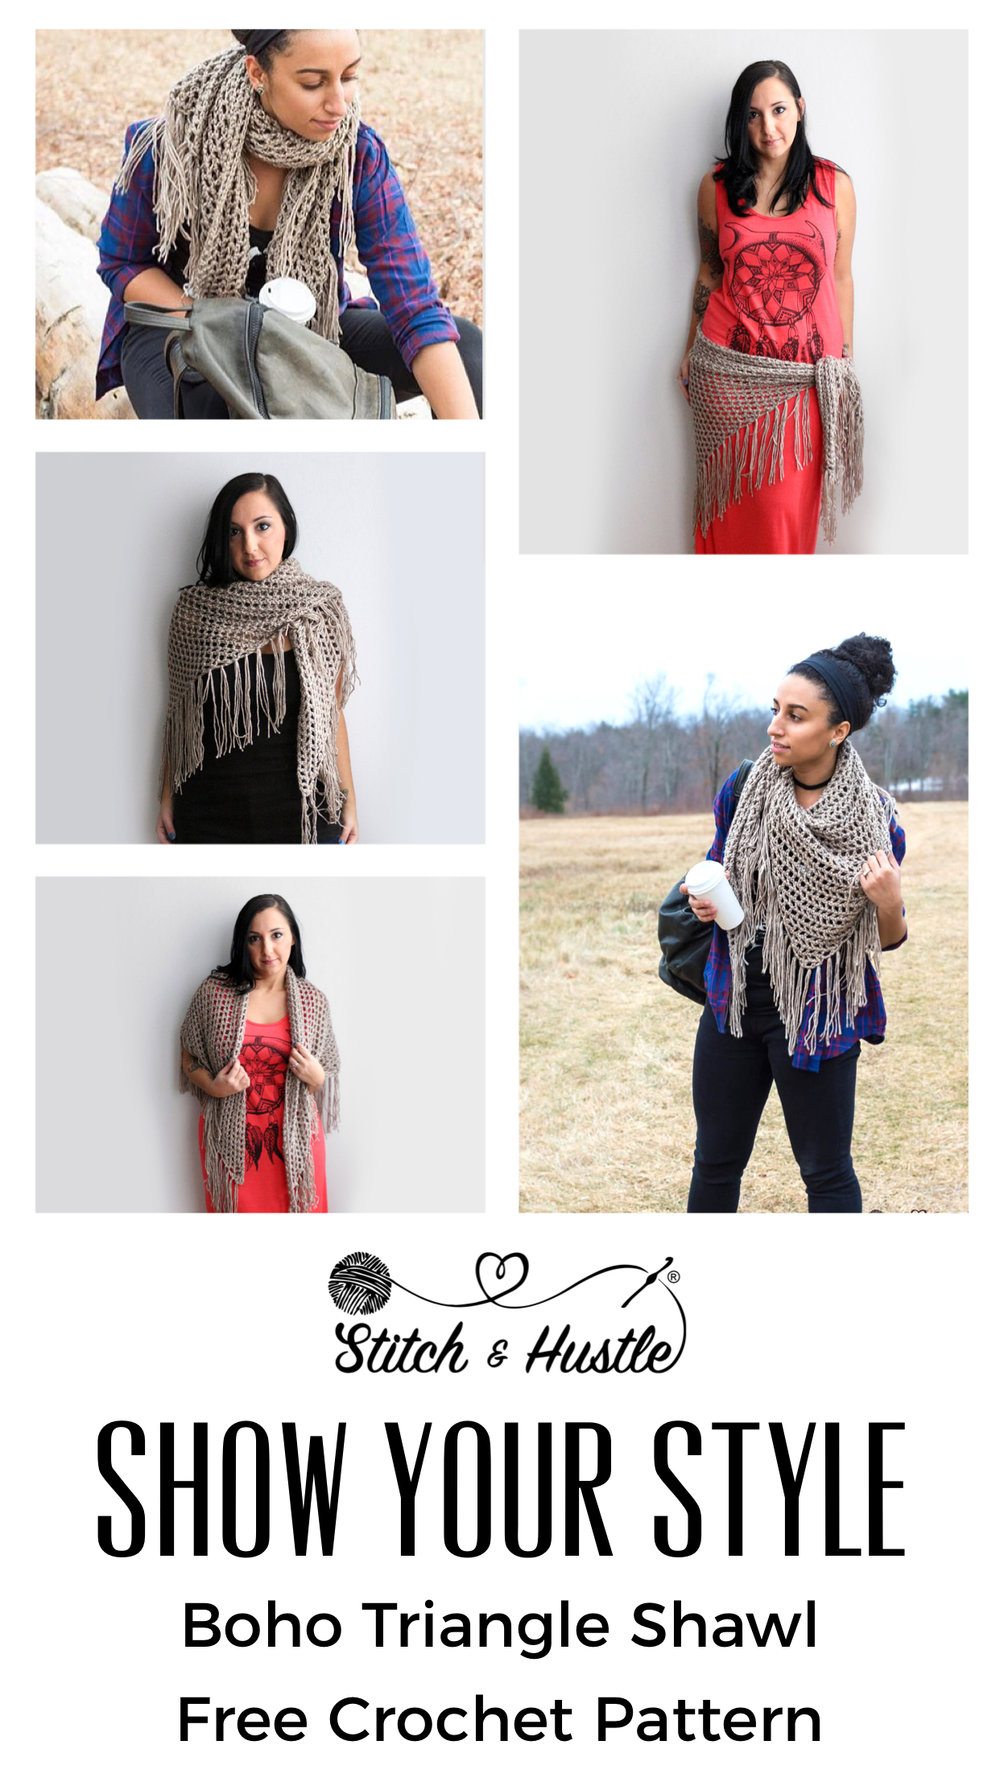 boho-fringe-shawl-wrap-crochet-pattern-11.jpg